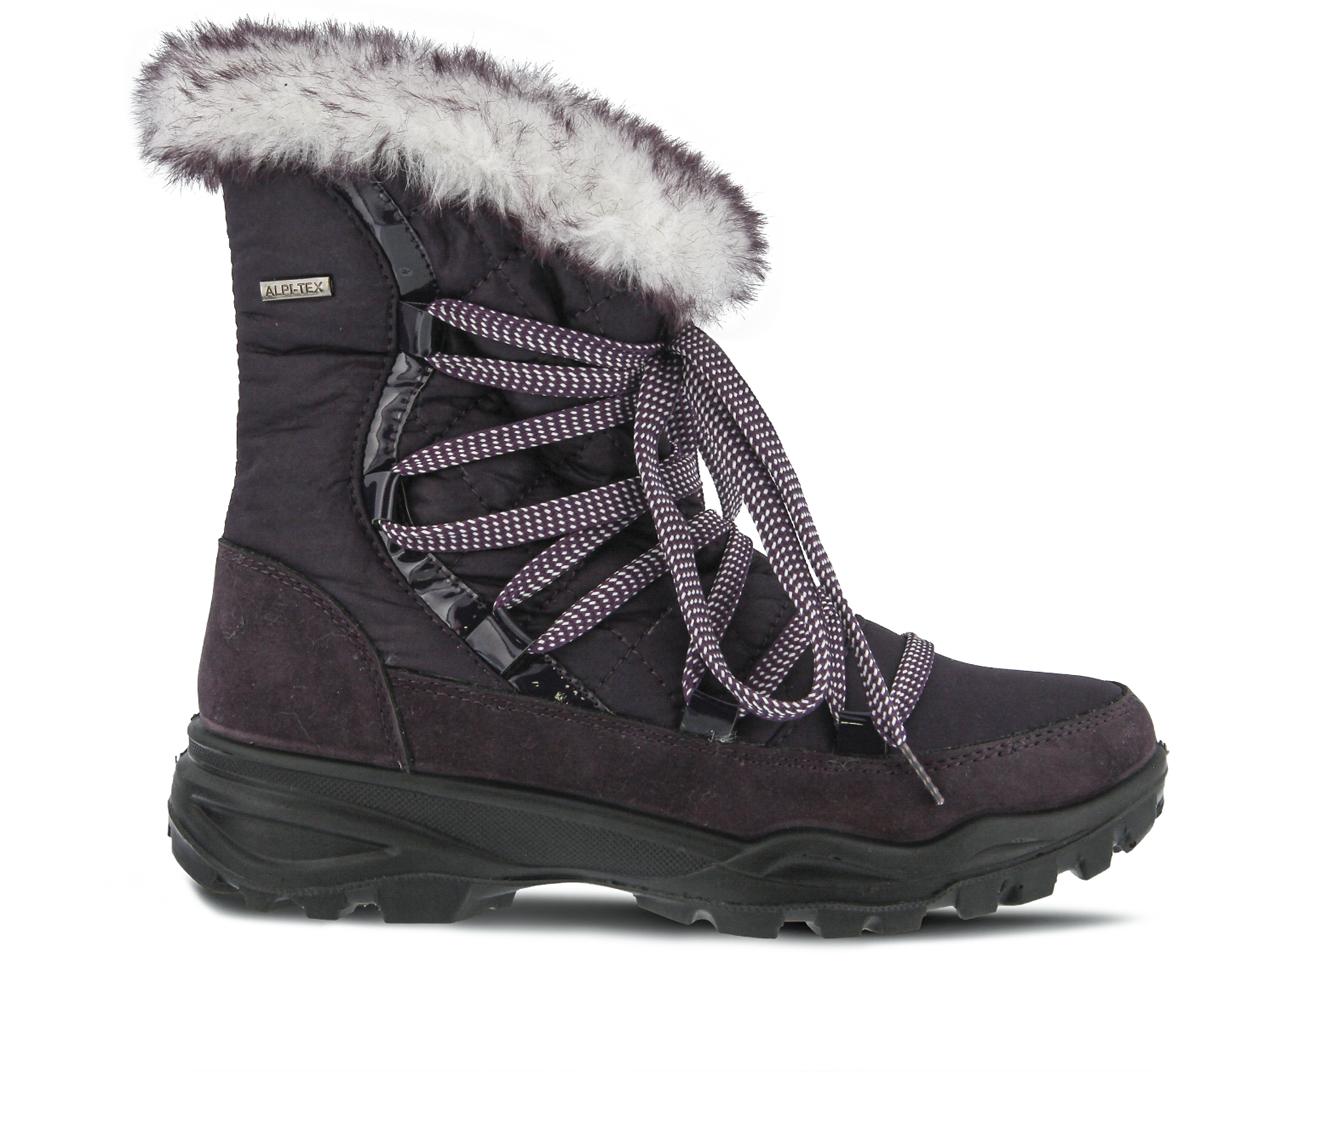 Flexus Denilia Women's Boots (Purple Canvas)